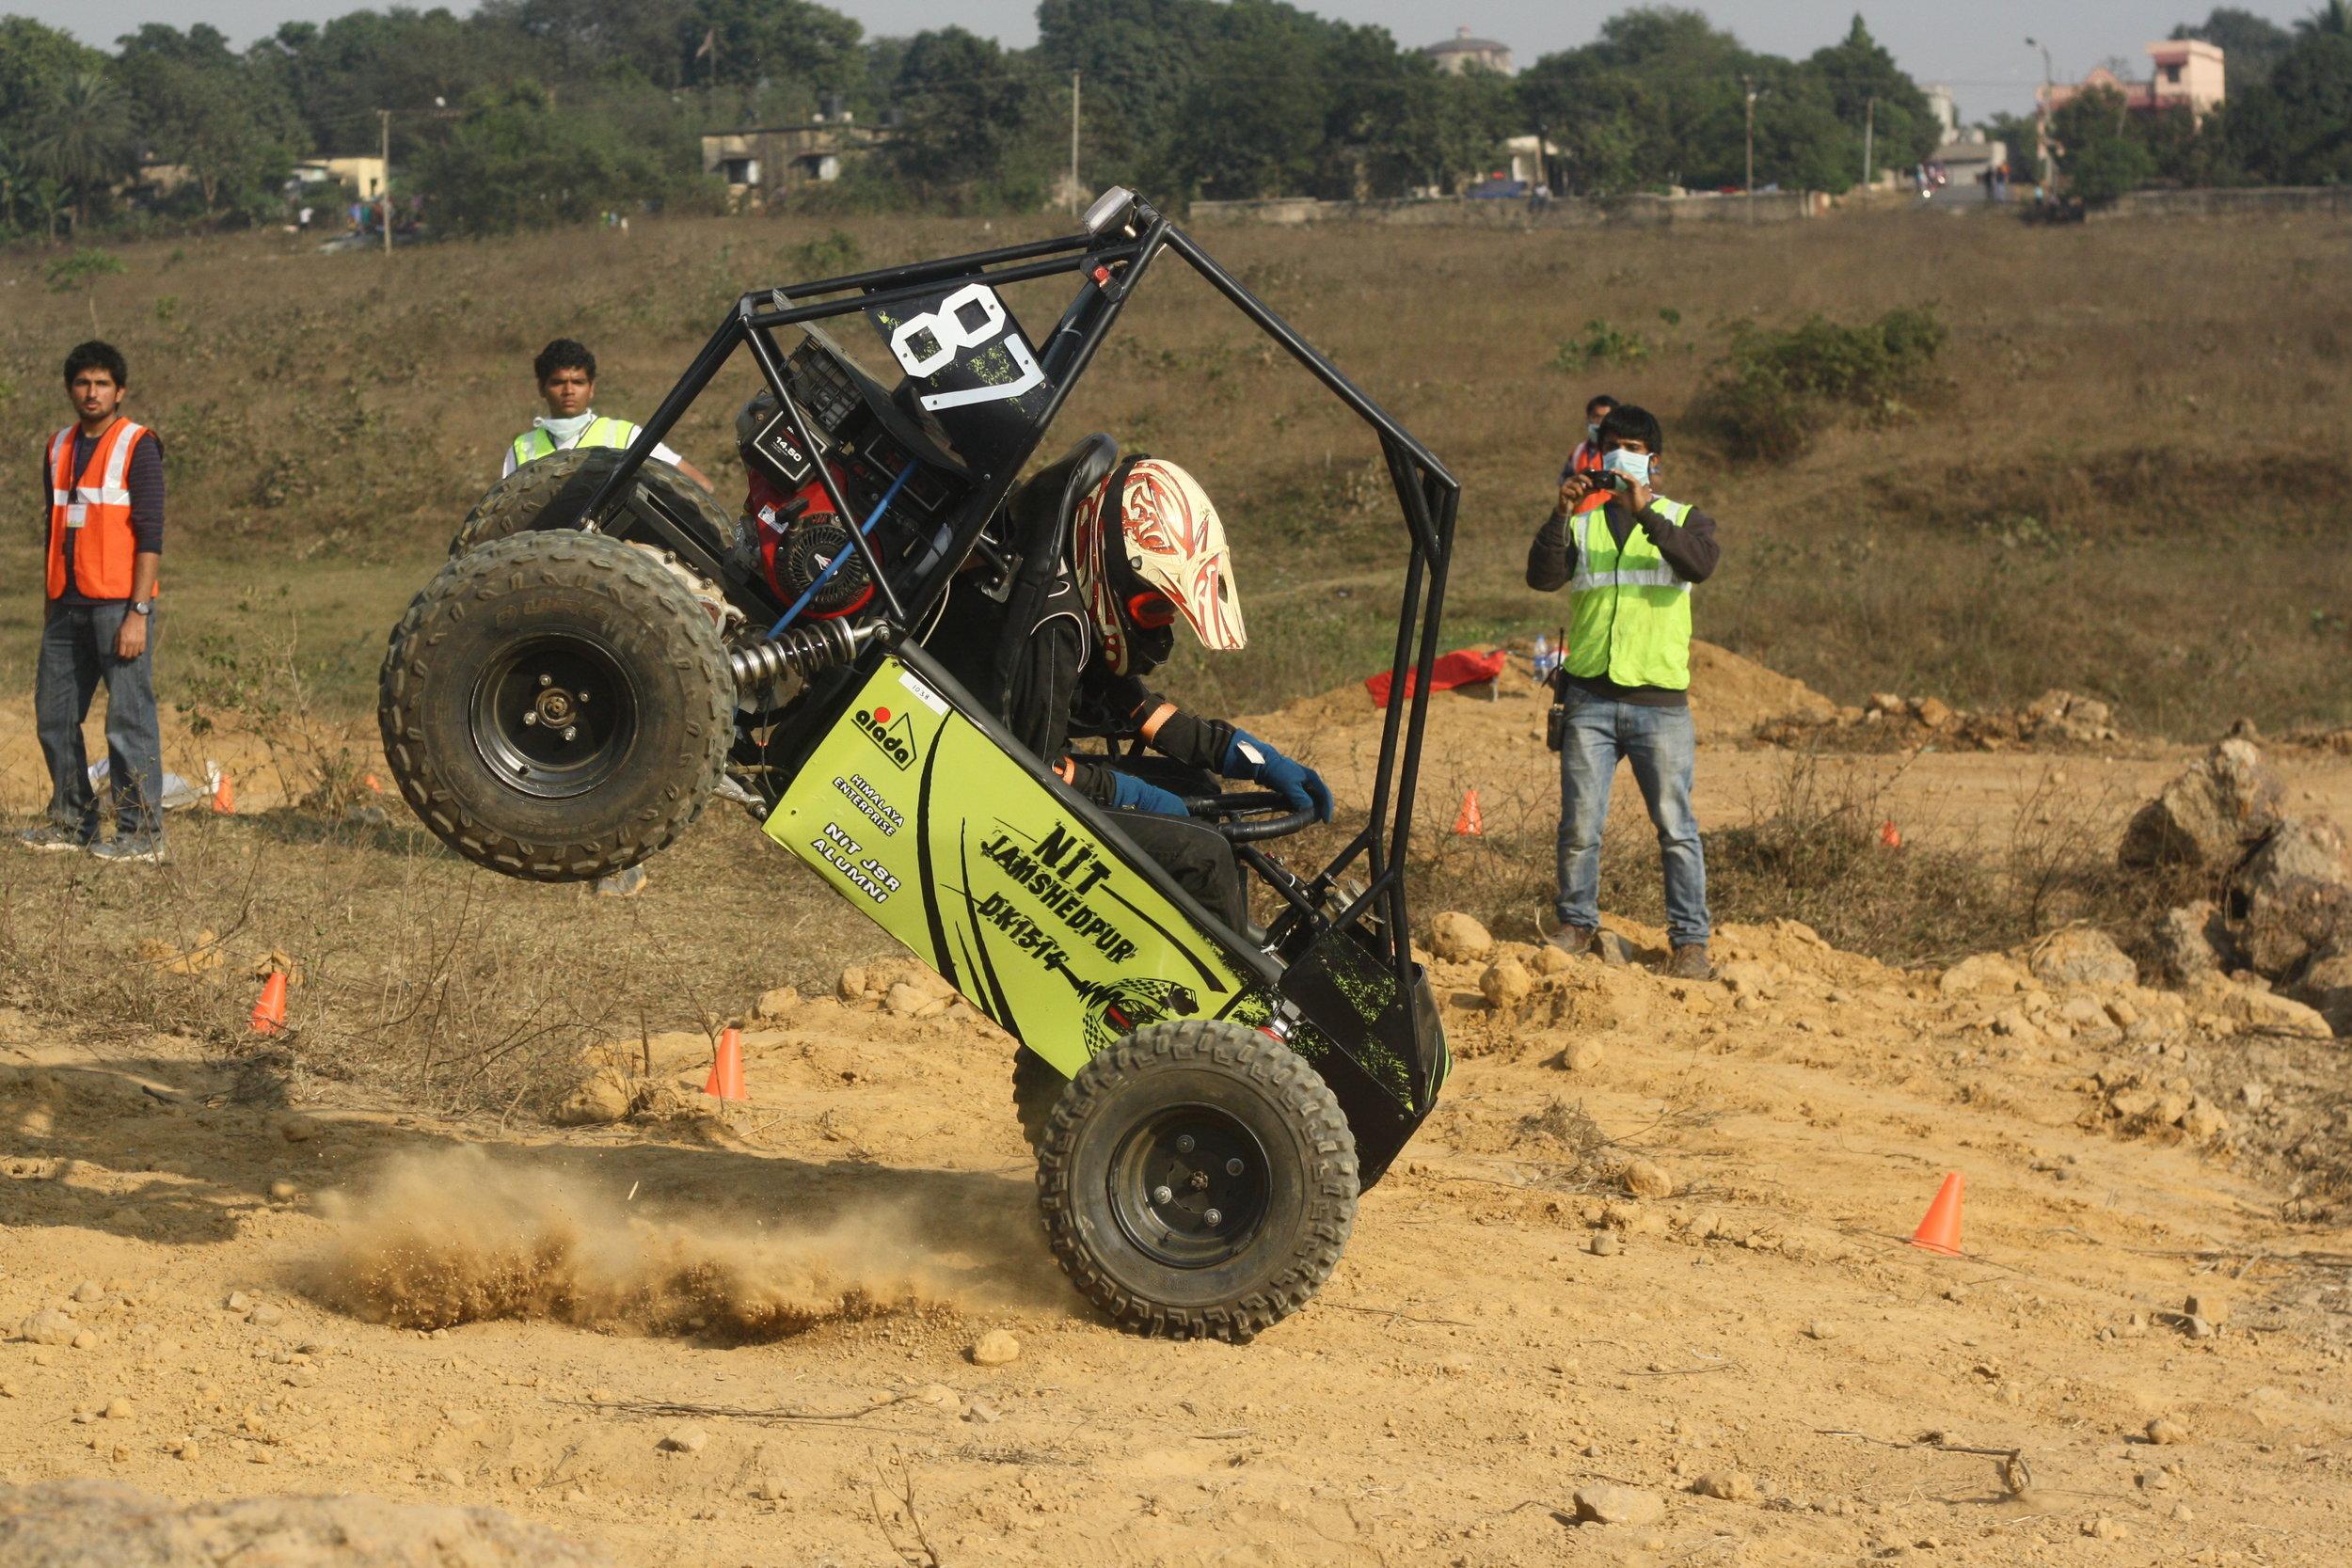 Maneuverability -